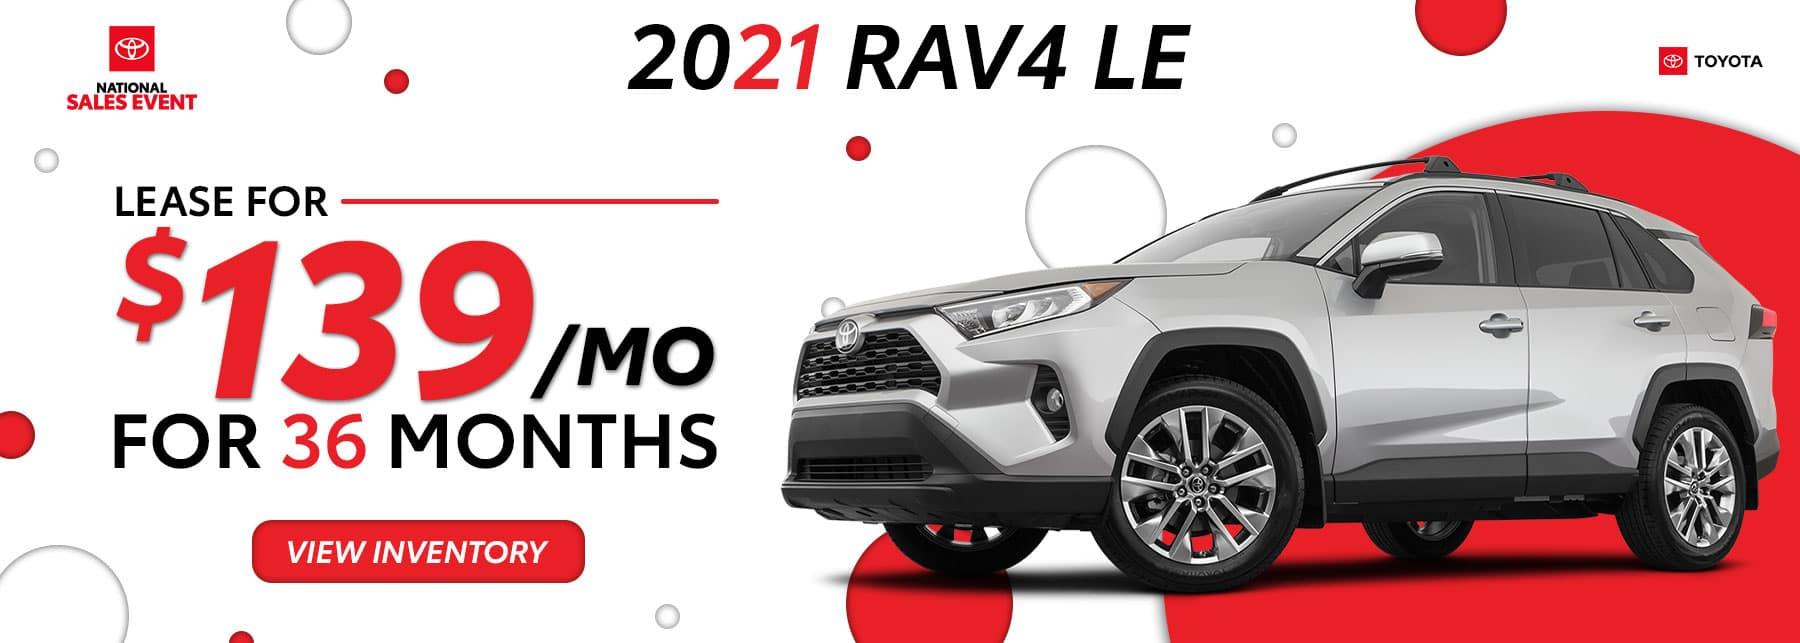 Toyota RAV4 August Offers